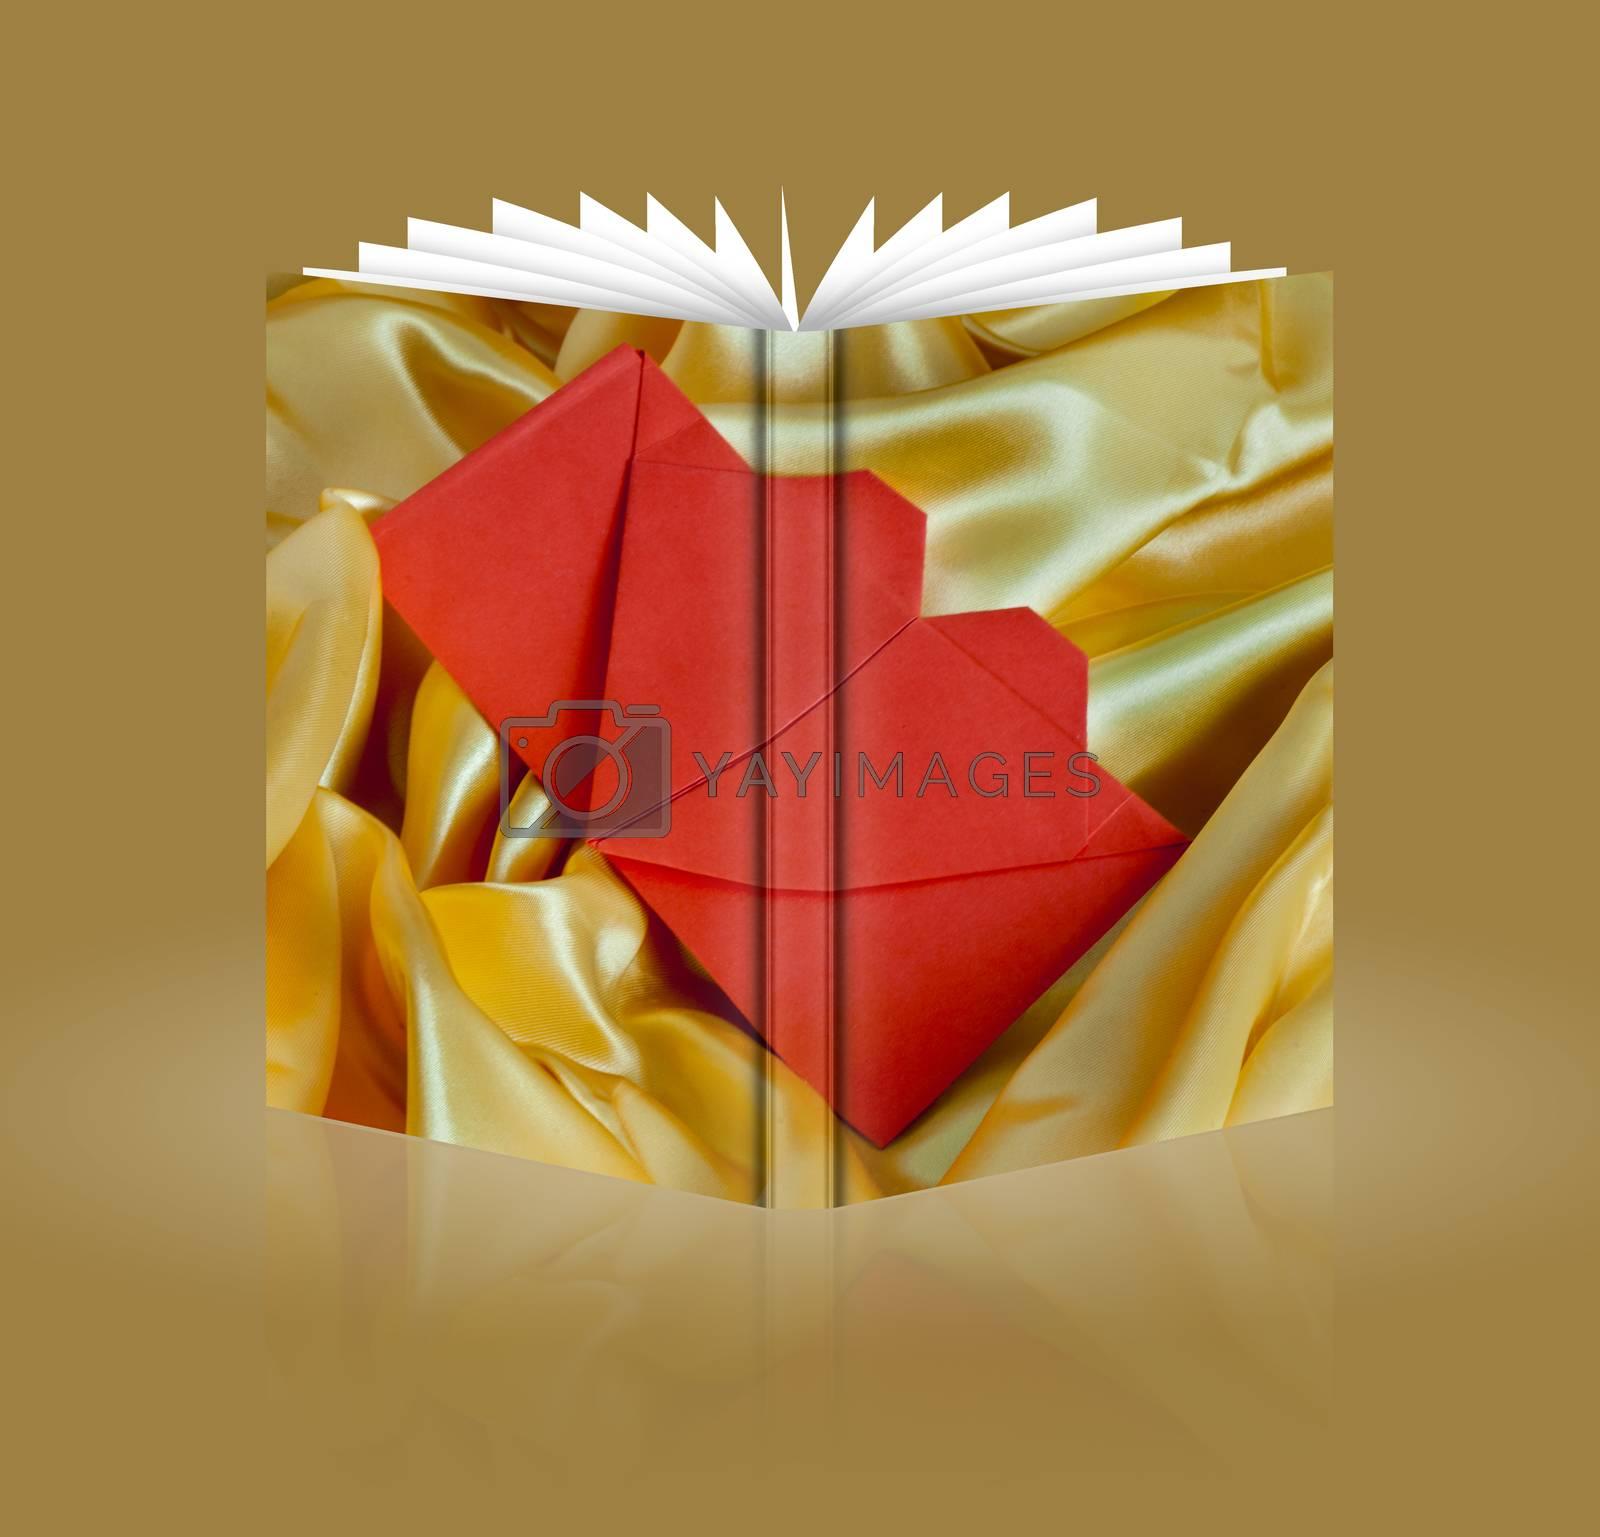 book of  orange heart for wedding invitation card